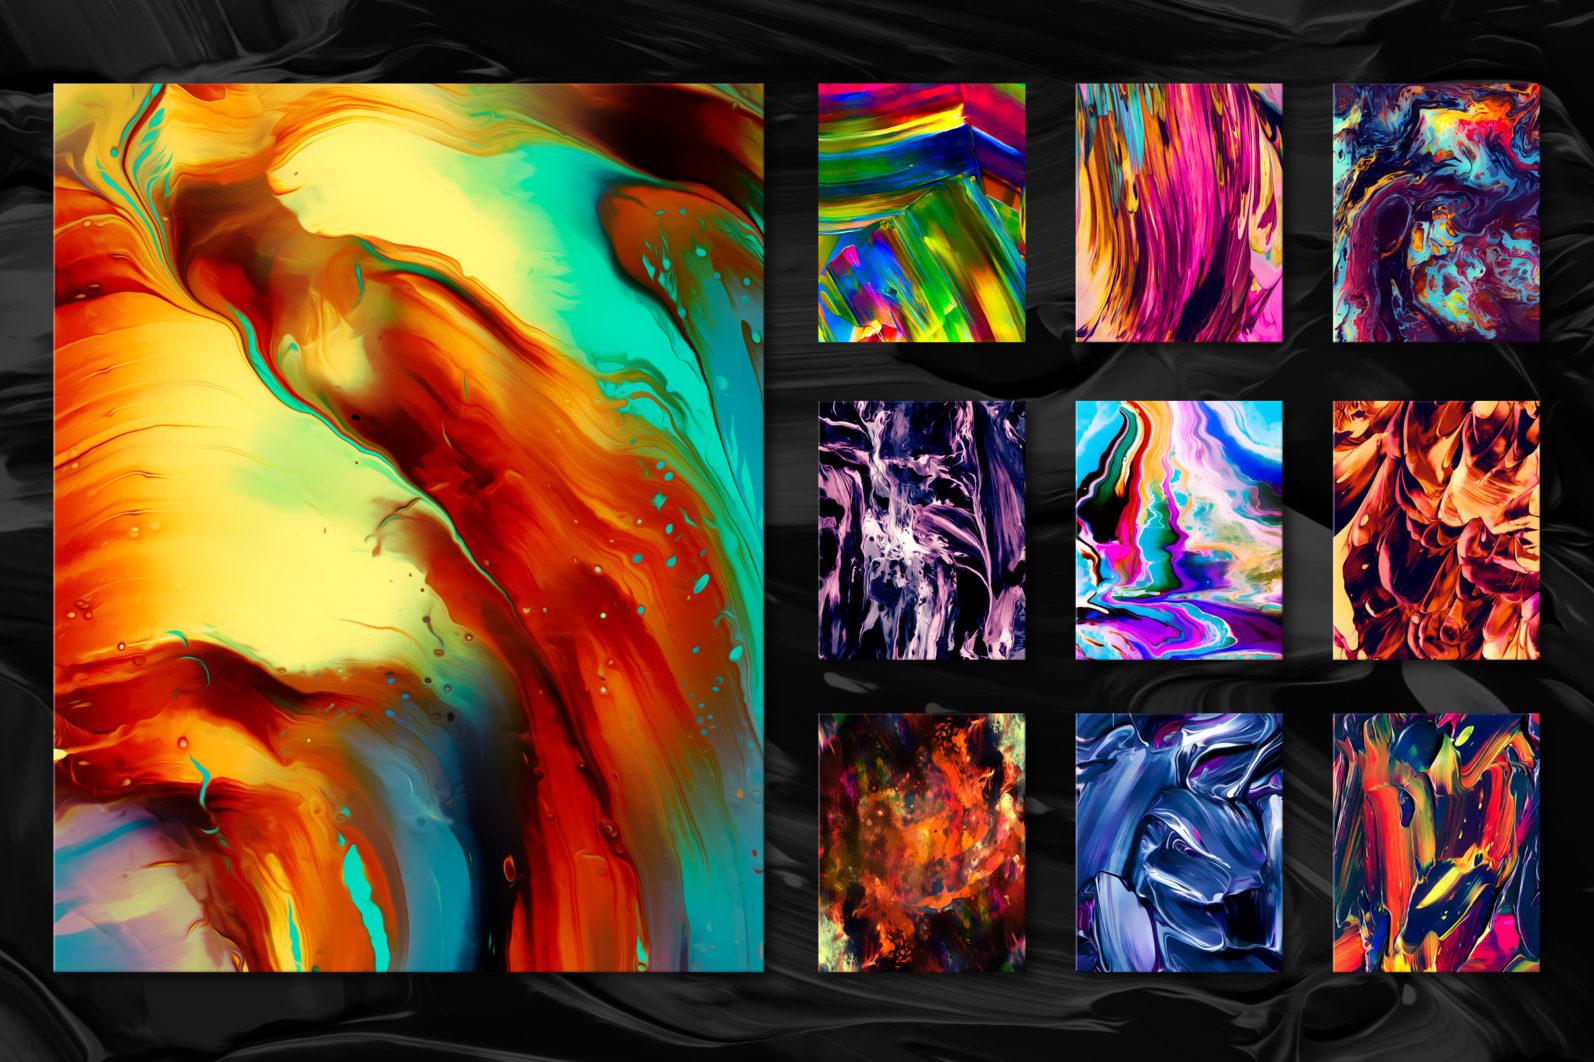 Flow, Vol. 2: 100 Smooth Paint Textures - Flow Vol 2 Preview 06 -